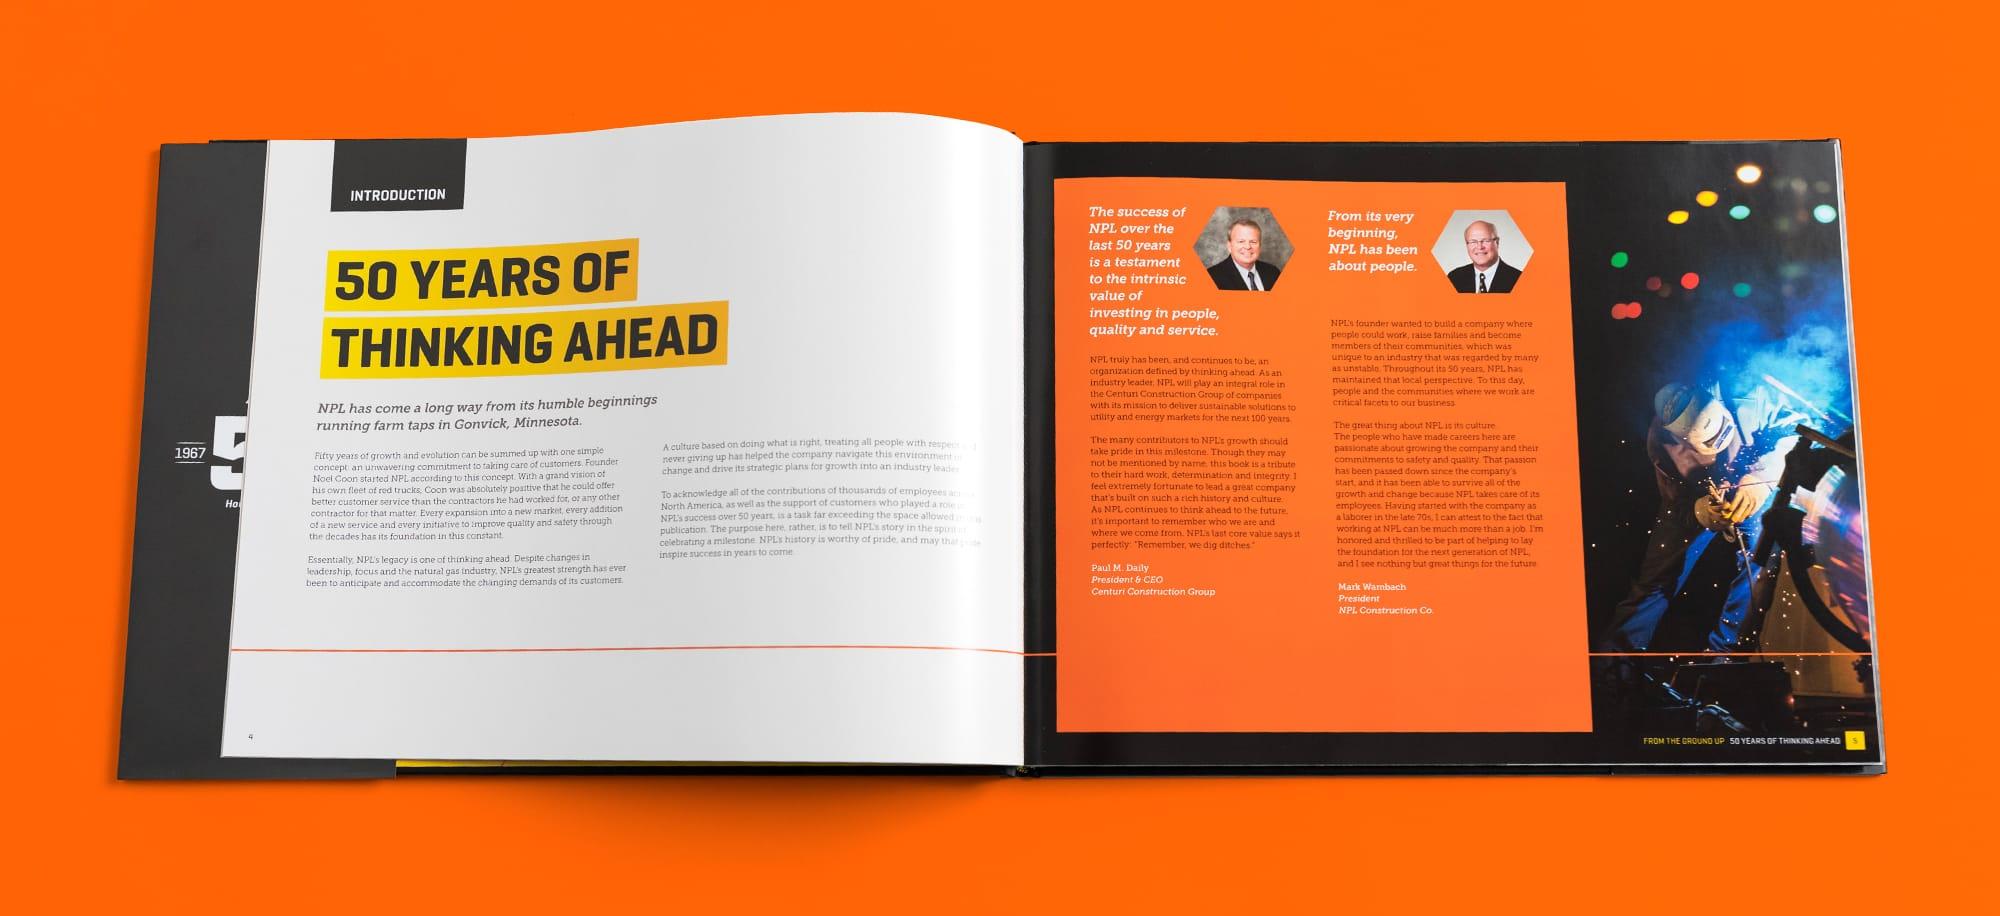 Interior introduction spread of NPL anniversary book